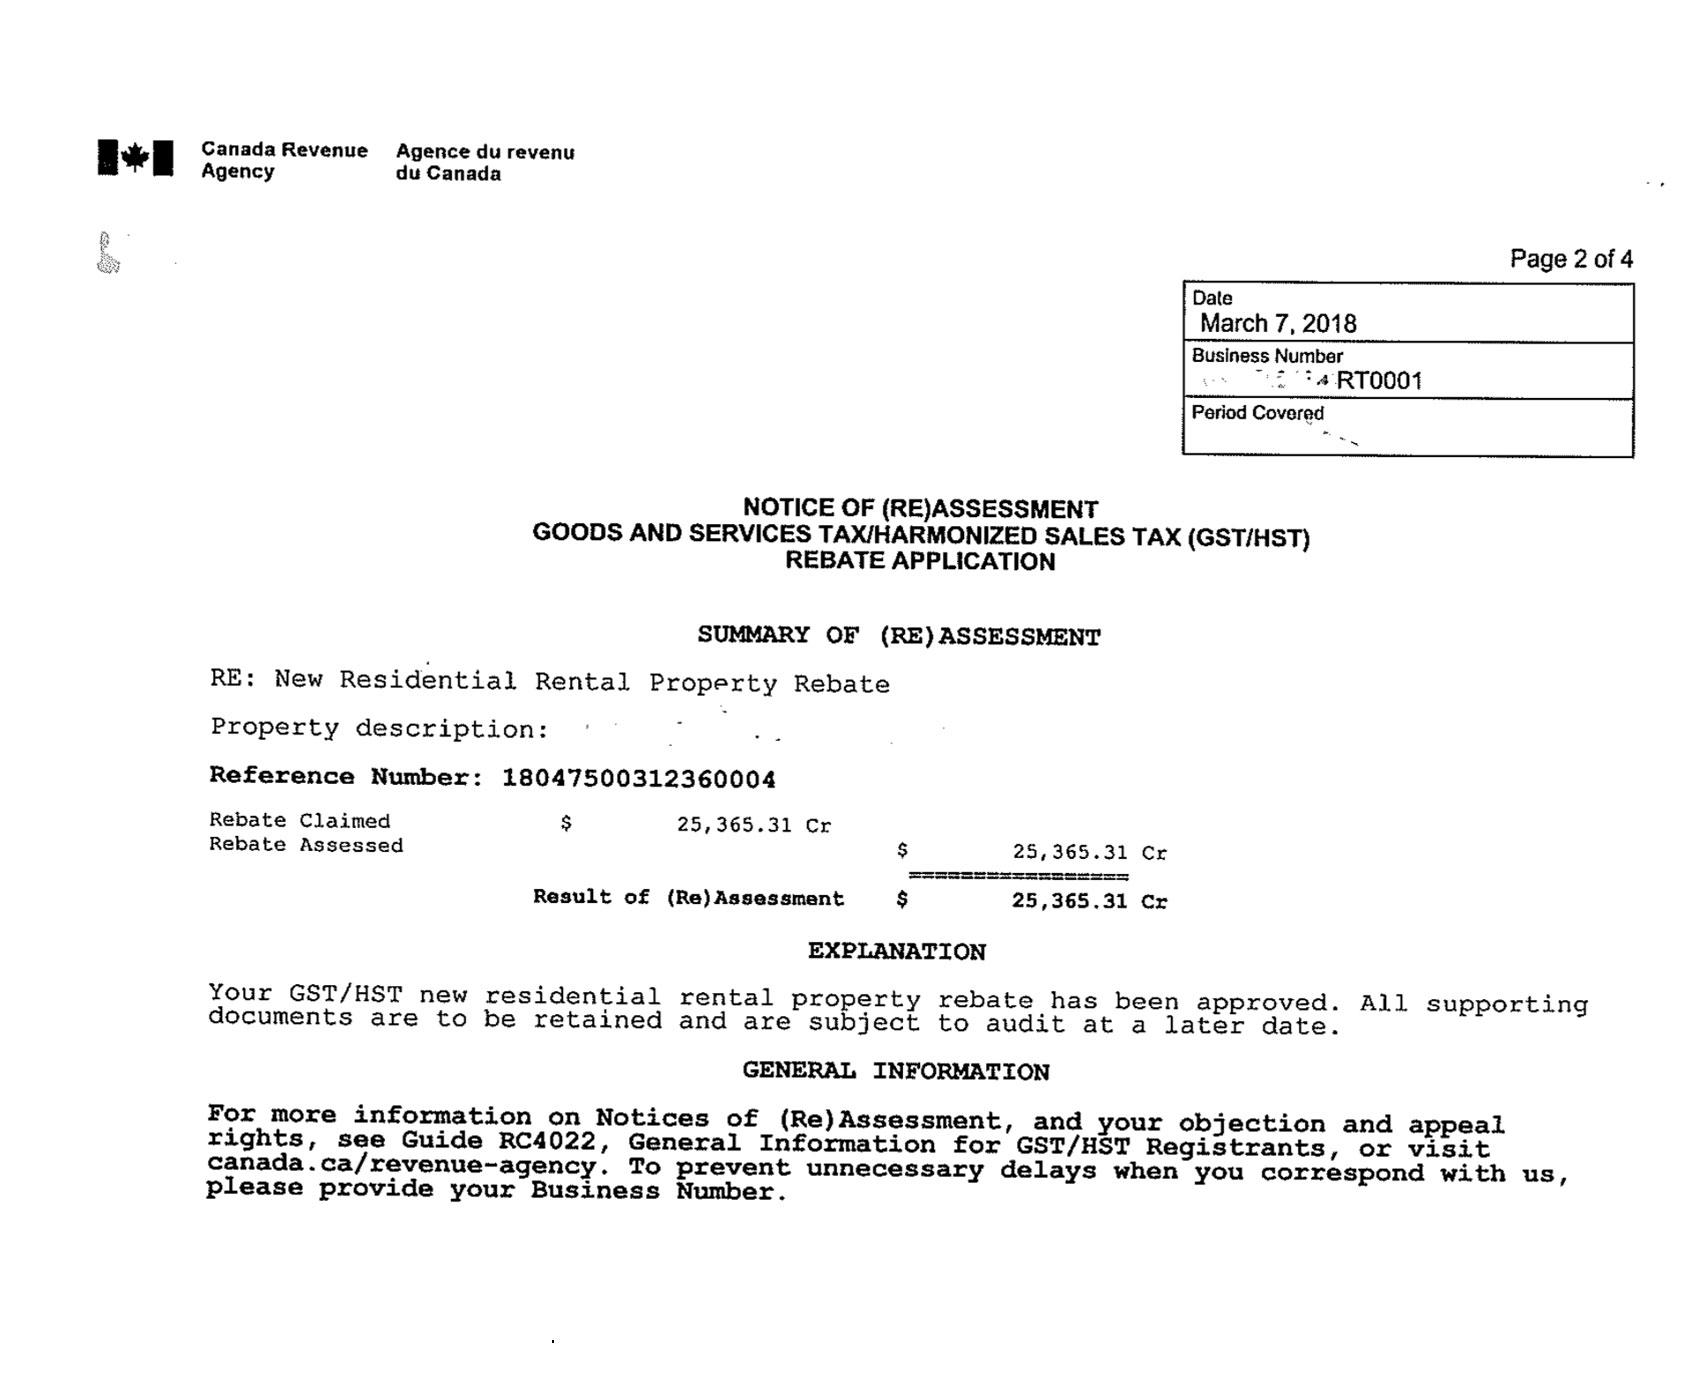 Received $25,365 in HST Rebate for New Residential Rental Property Rebate -